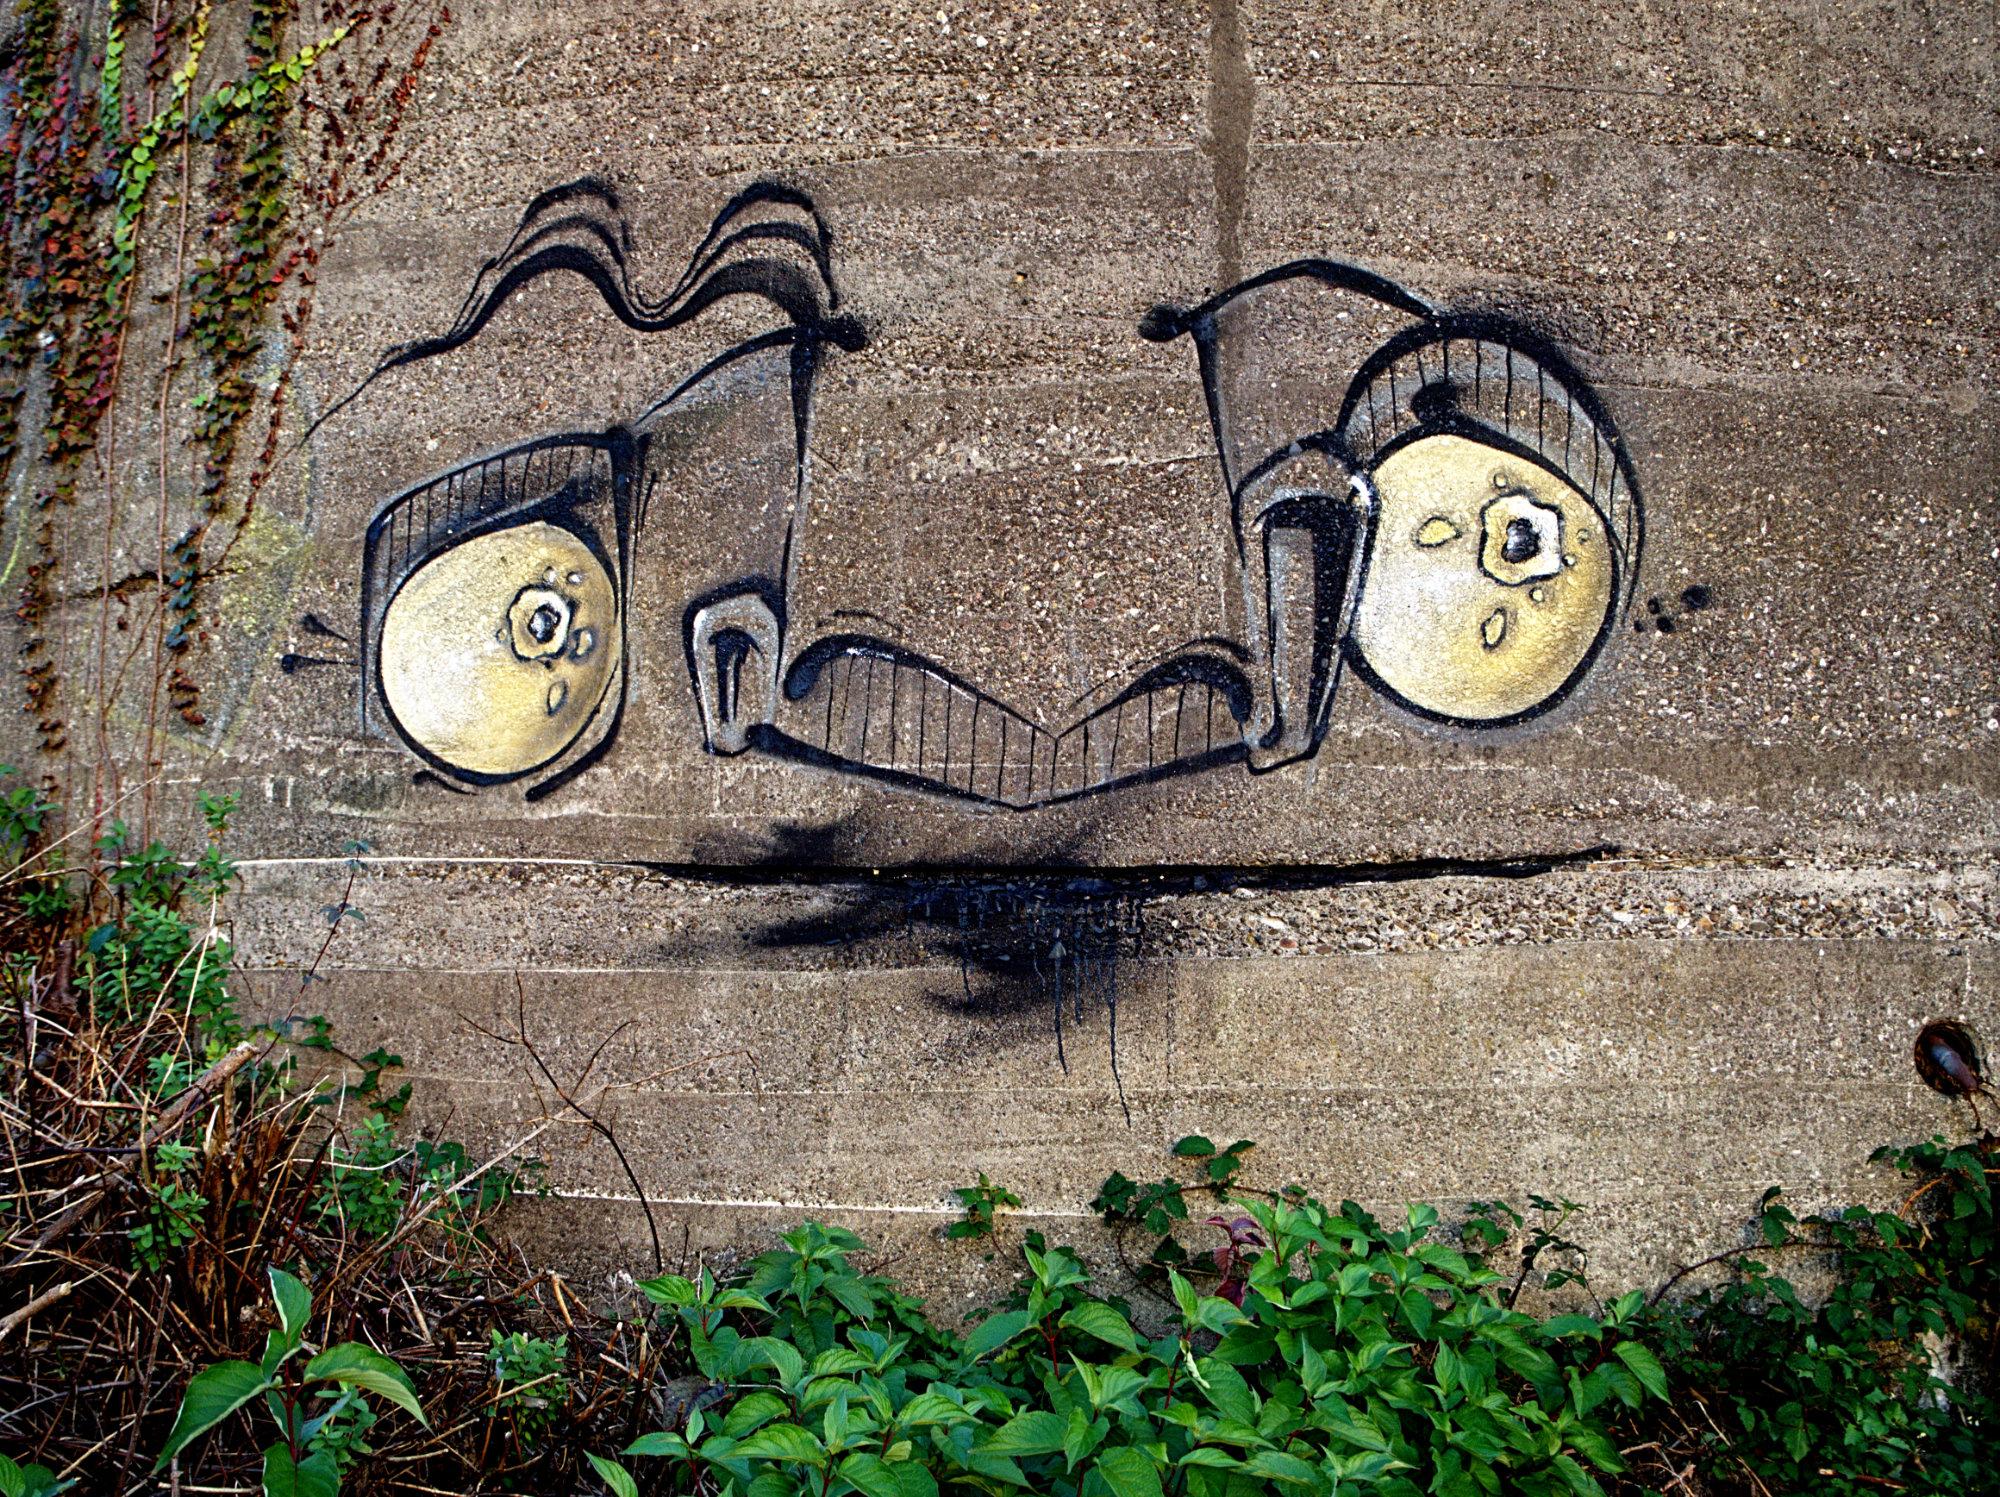 Graffiti Duisburg graffiti bunker krieg duisburg wedau detail joachim dudek